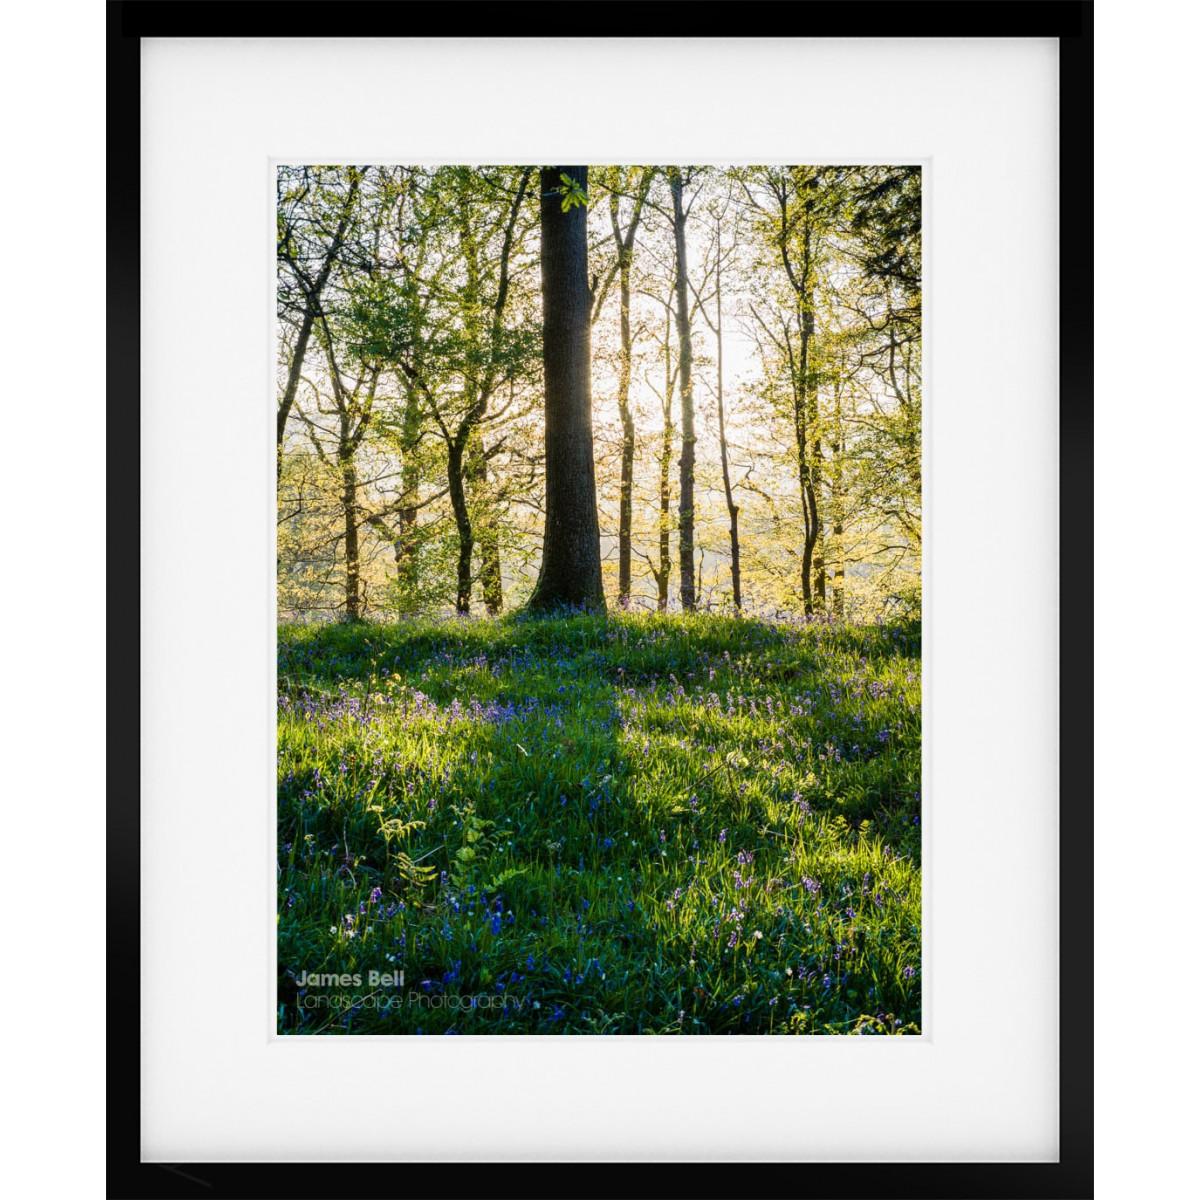 Lake District Bluebell wood framed print